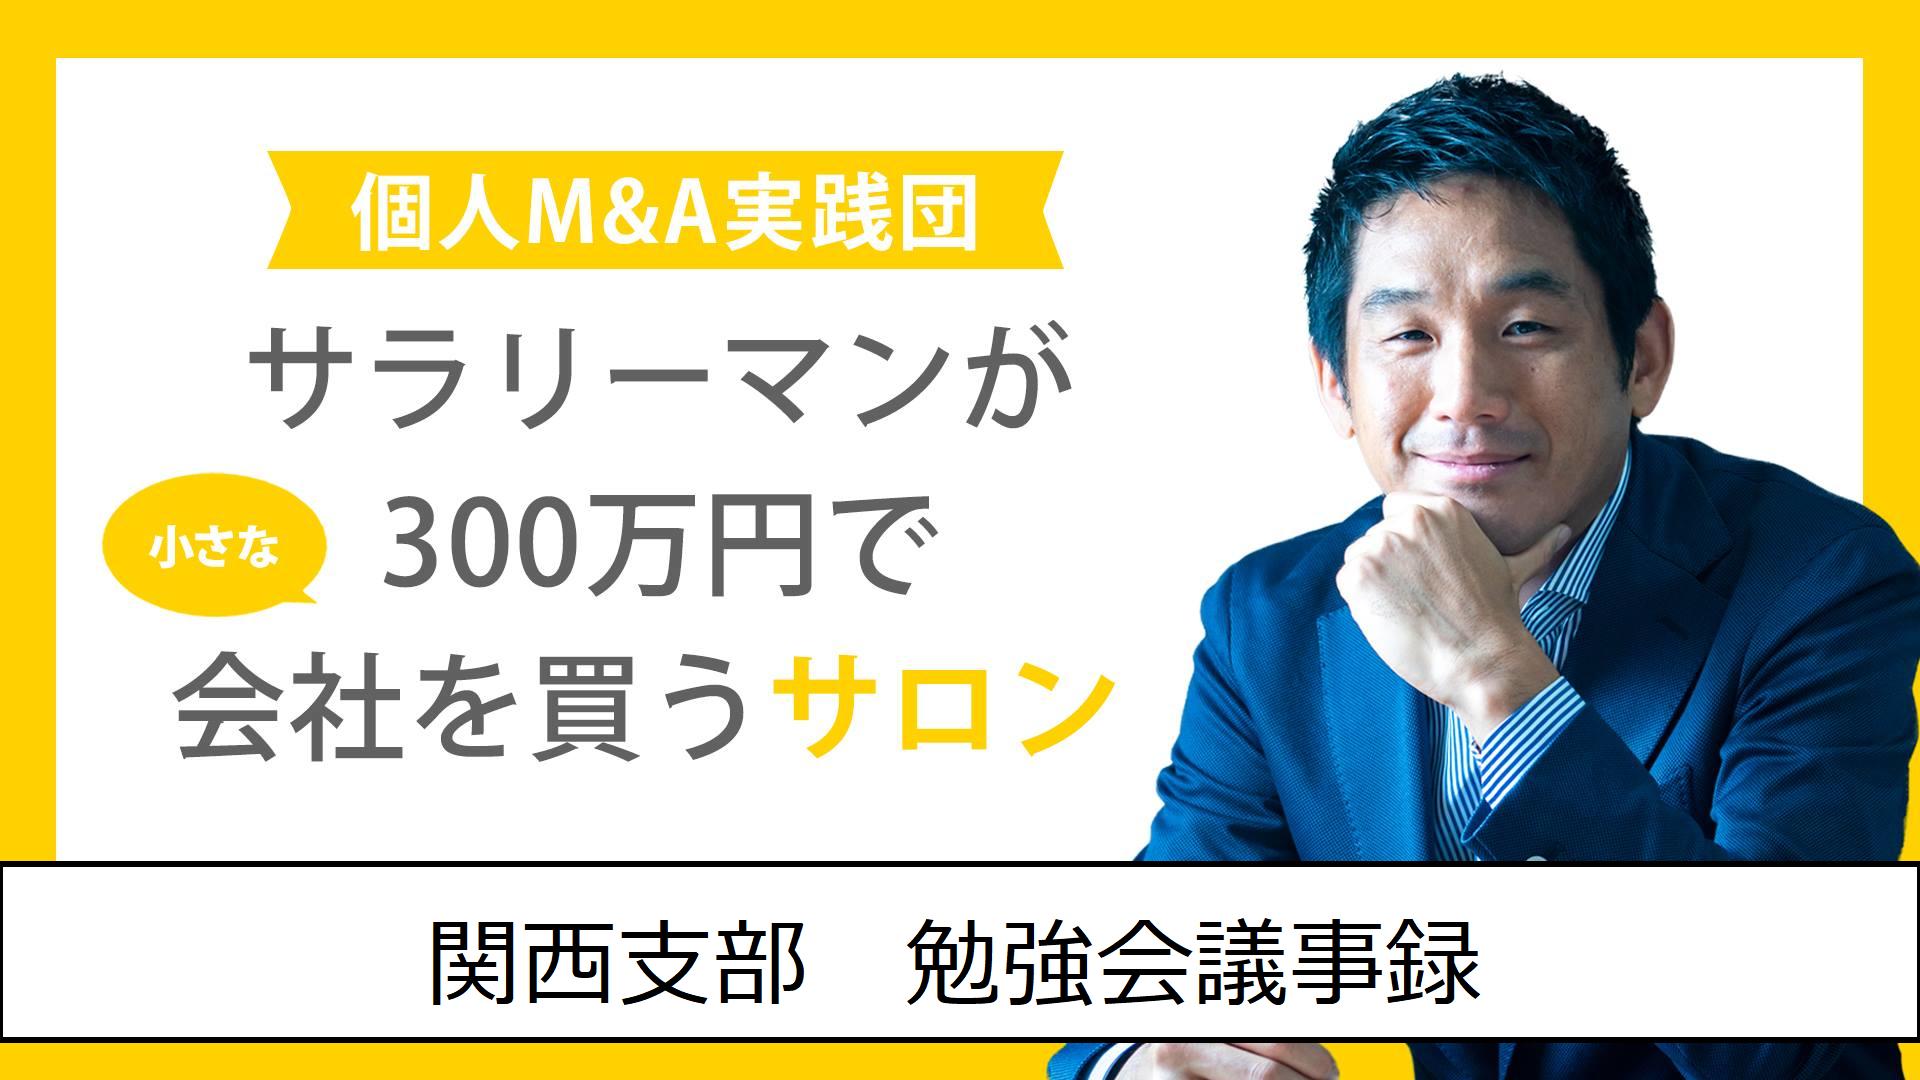 【コラム】関西支部 勉強会議事録